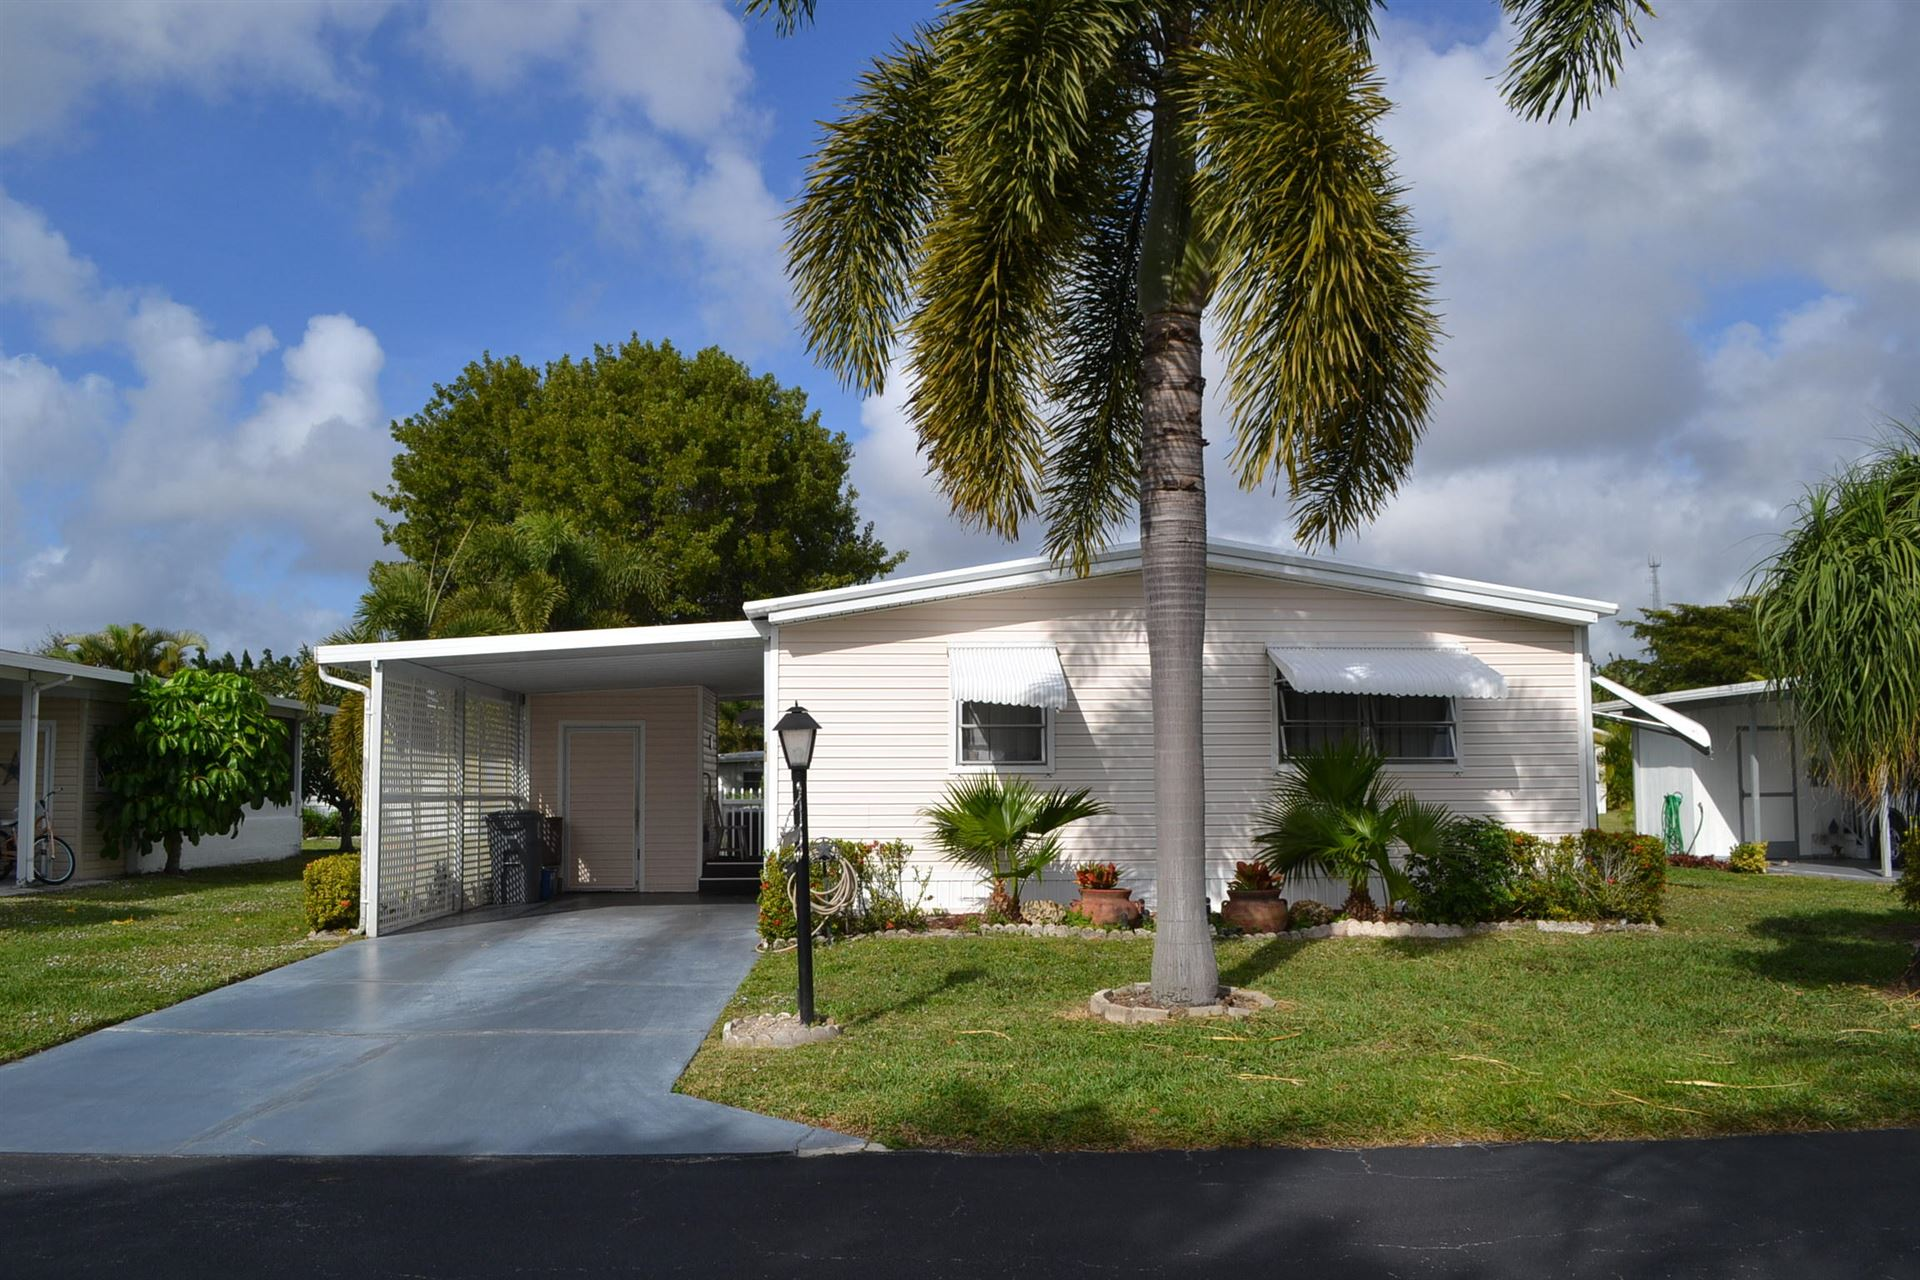 20903 Sunrise Drive, Boca Raton, FL 33433 - #: RX-10601204